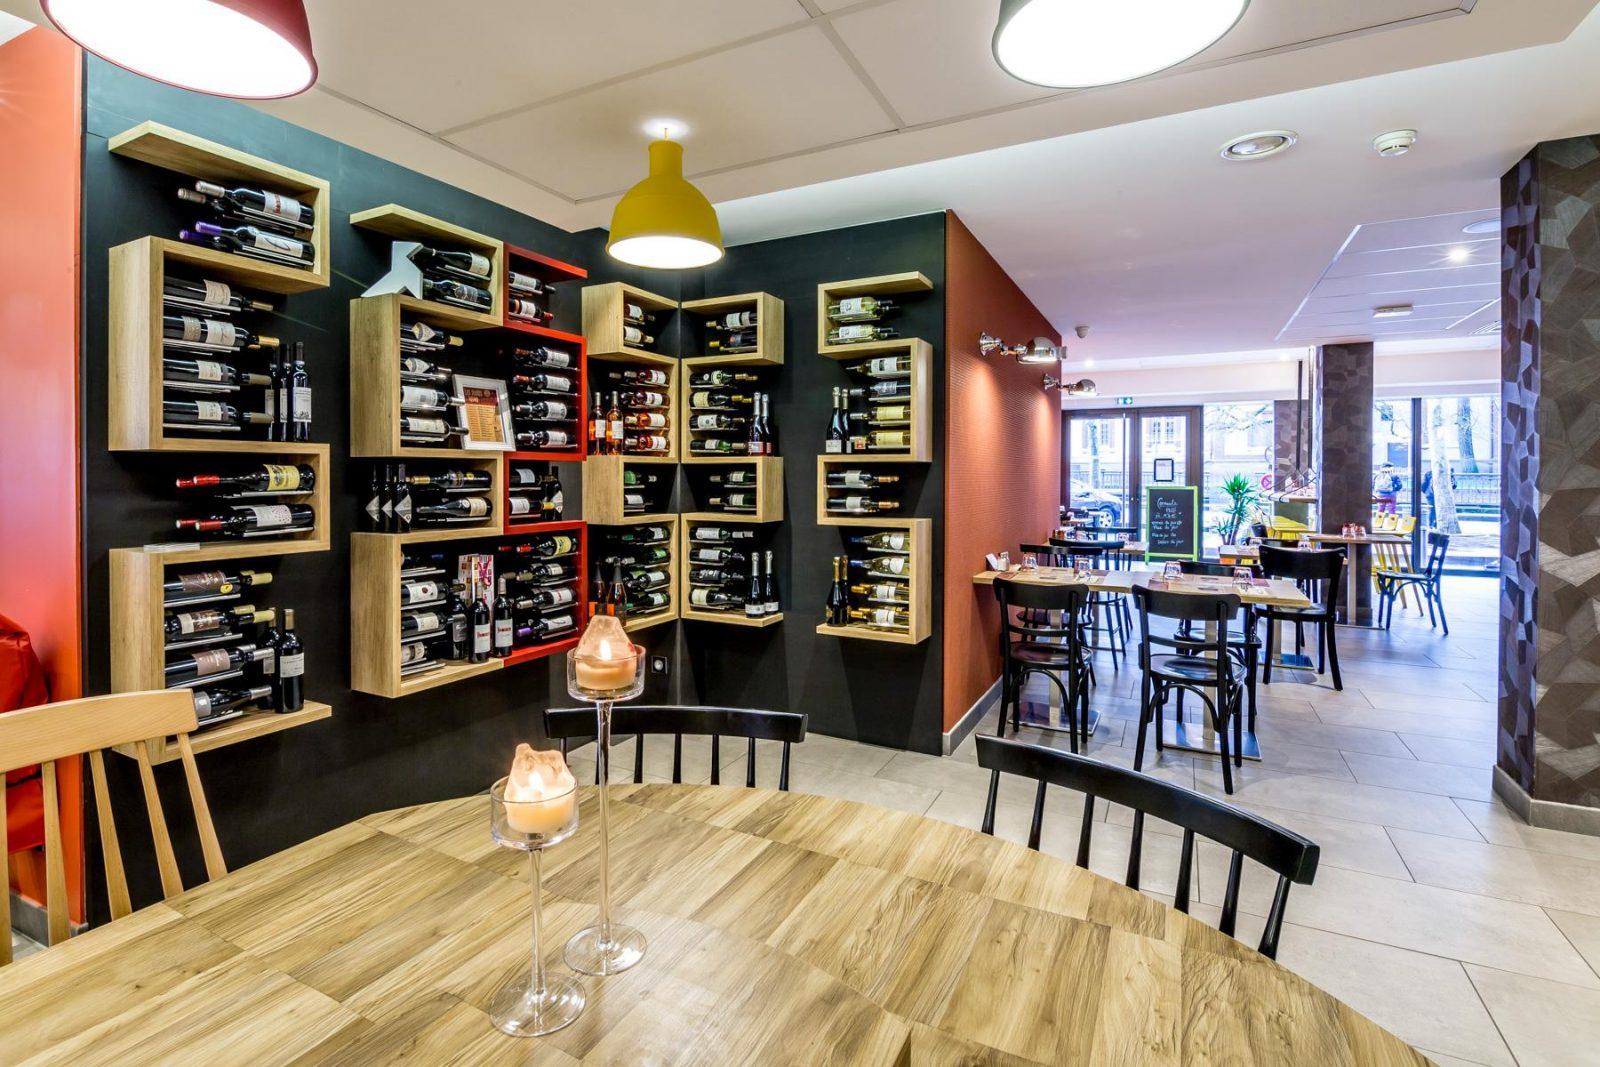 Esprit Kokotte – Hotel Ibis Style le Theatro Albi